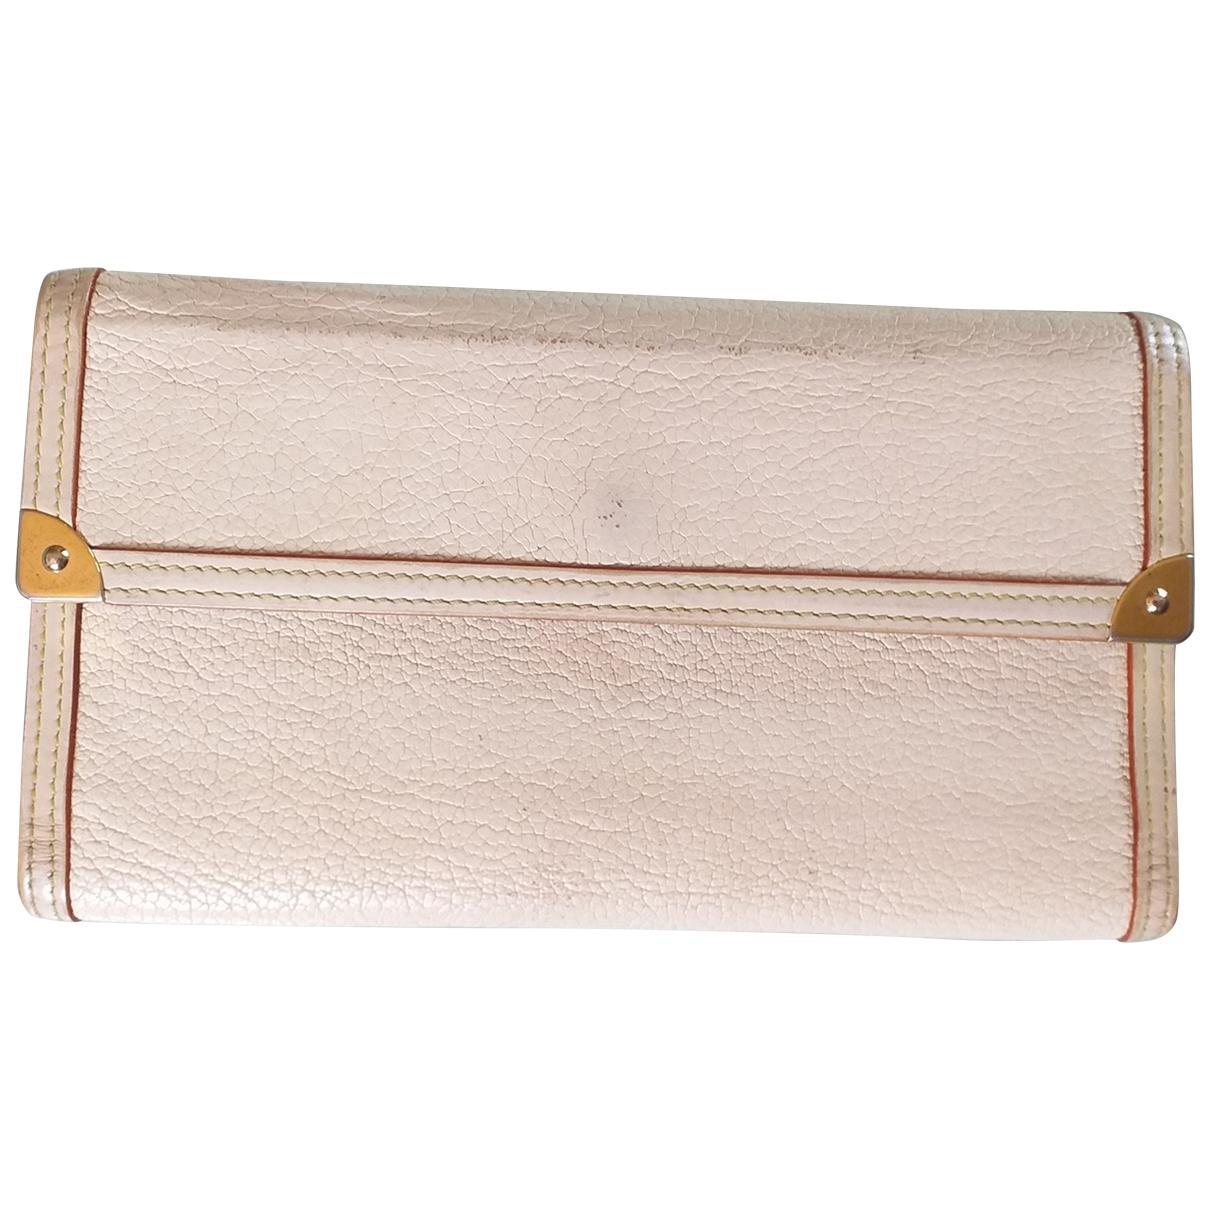 Louis Vuitton \N Portemonnaie in  Bunt Leder